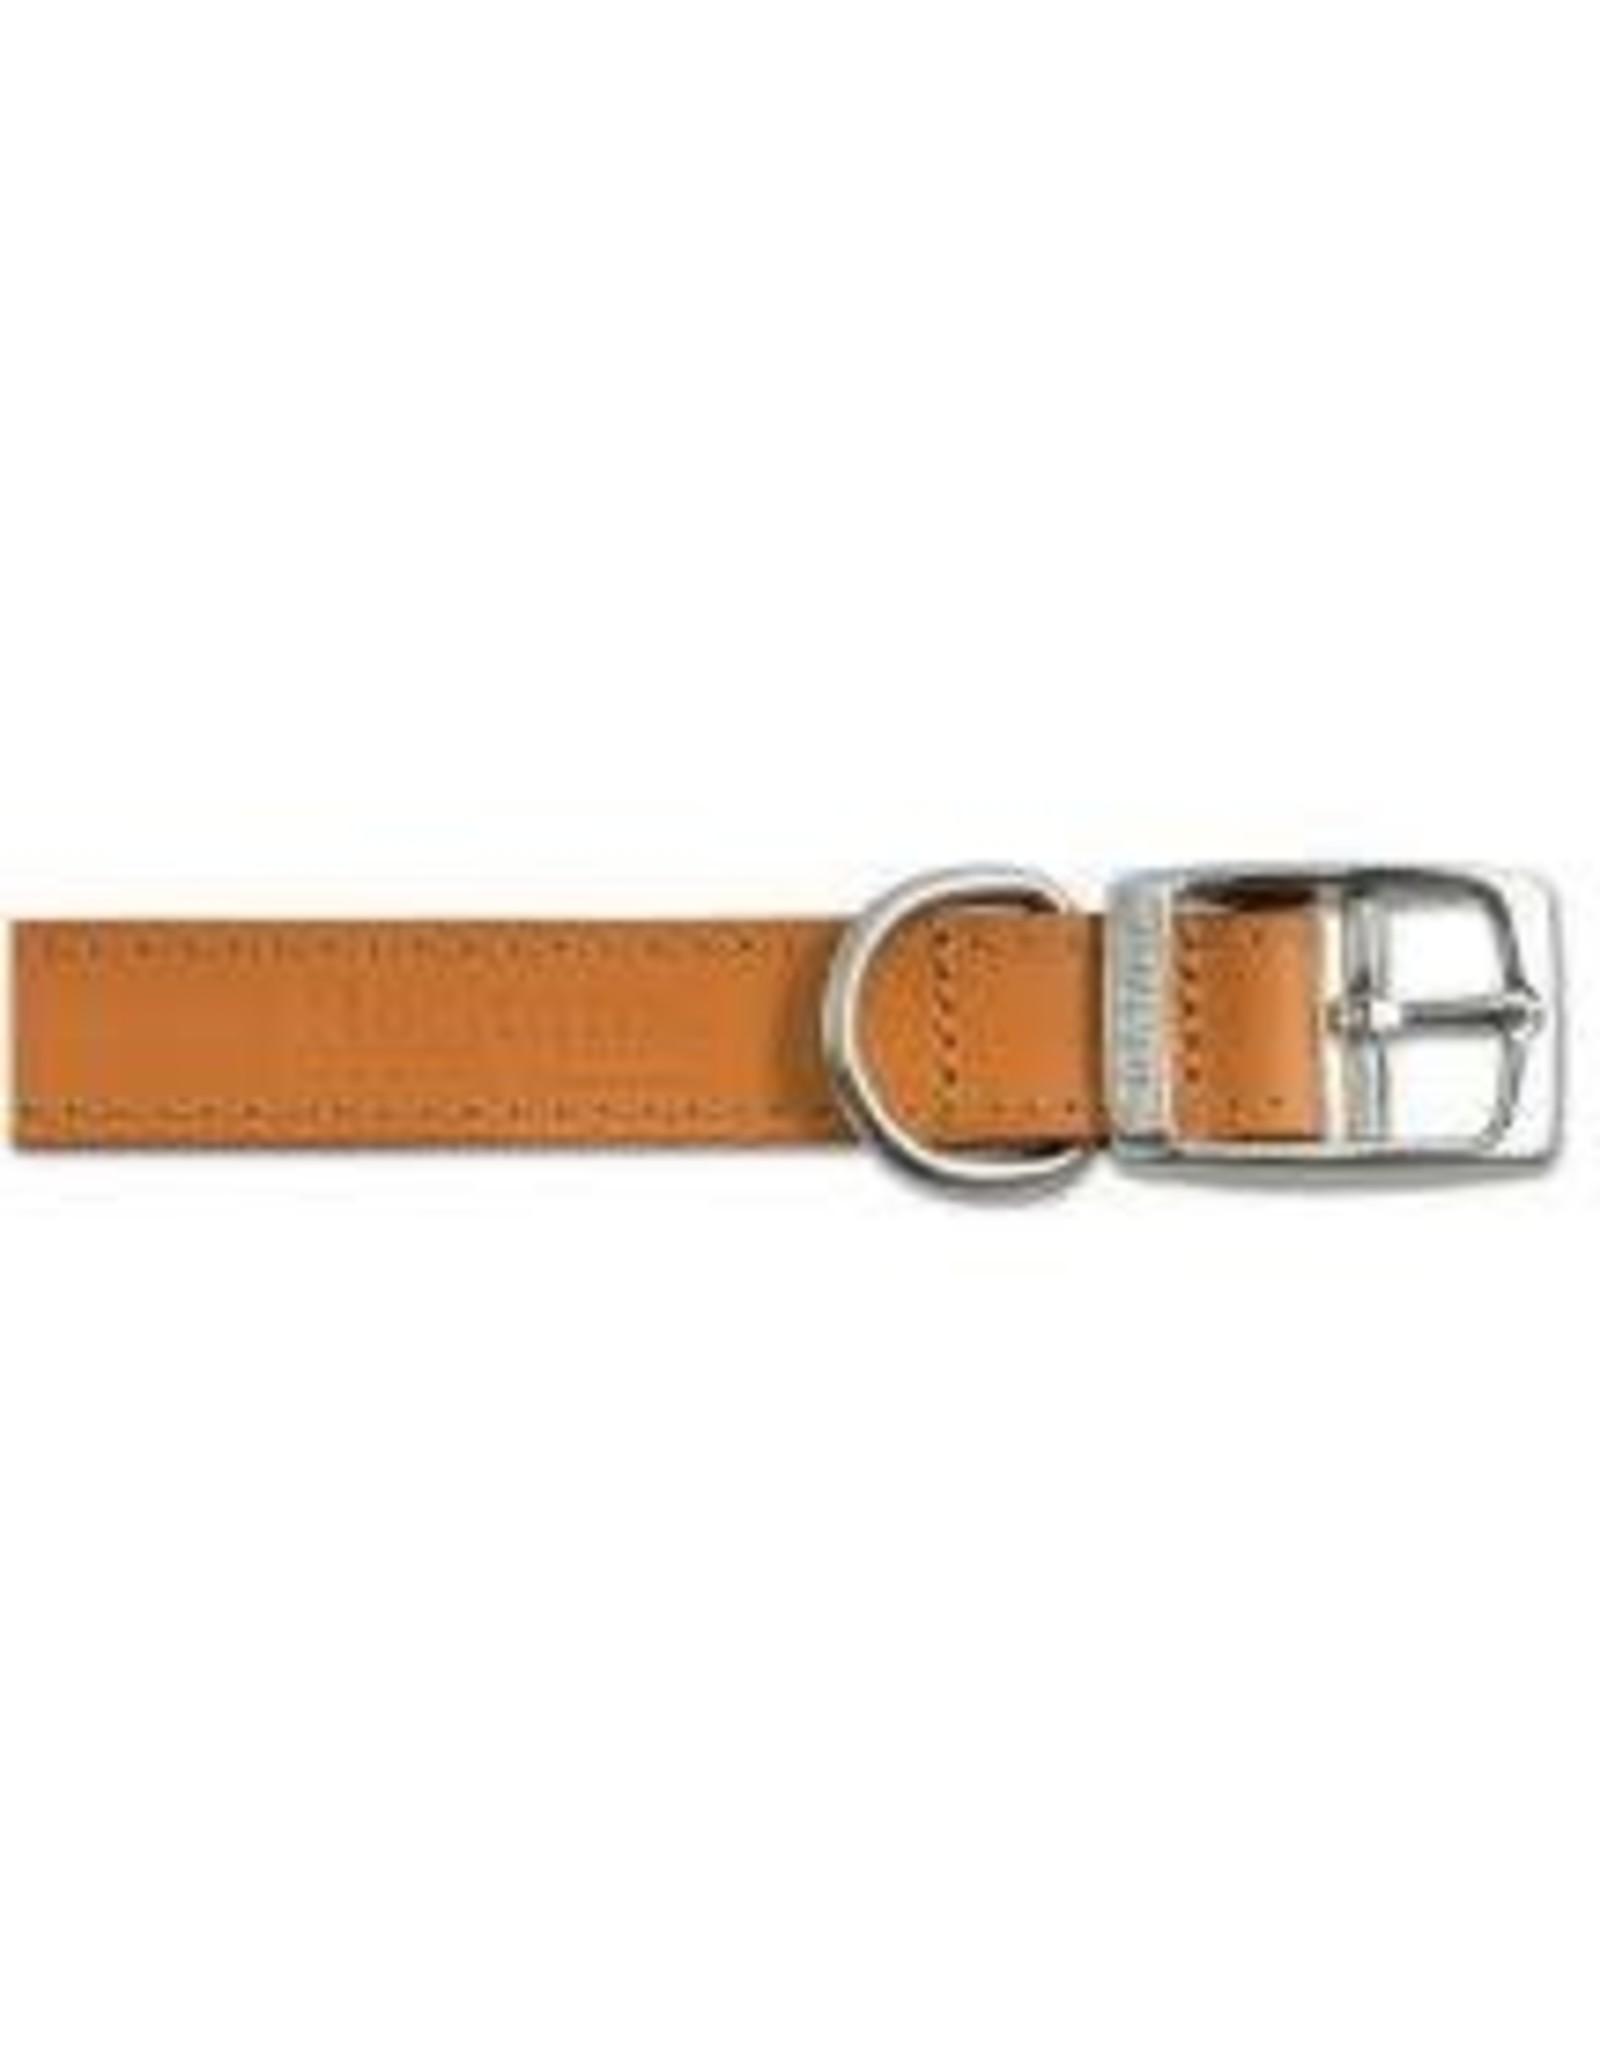 Ancol Ancol Leather Collar Tan